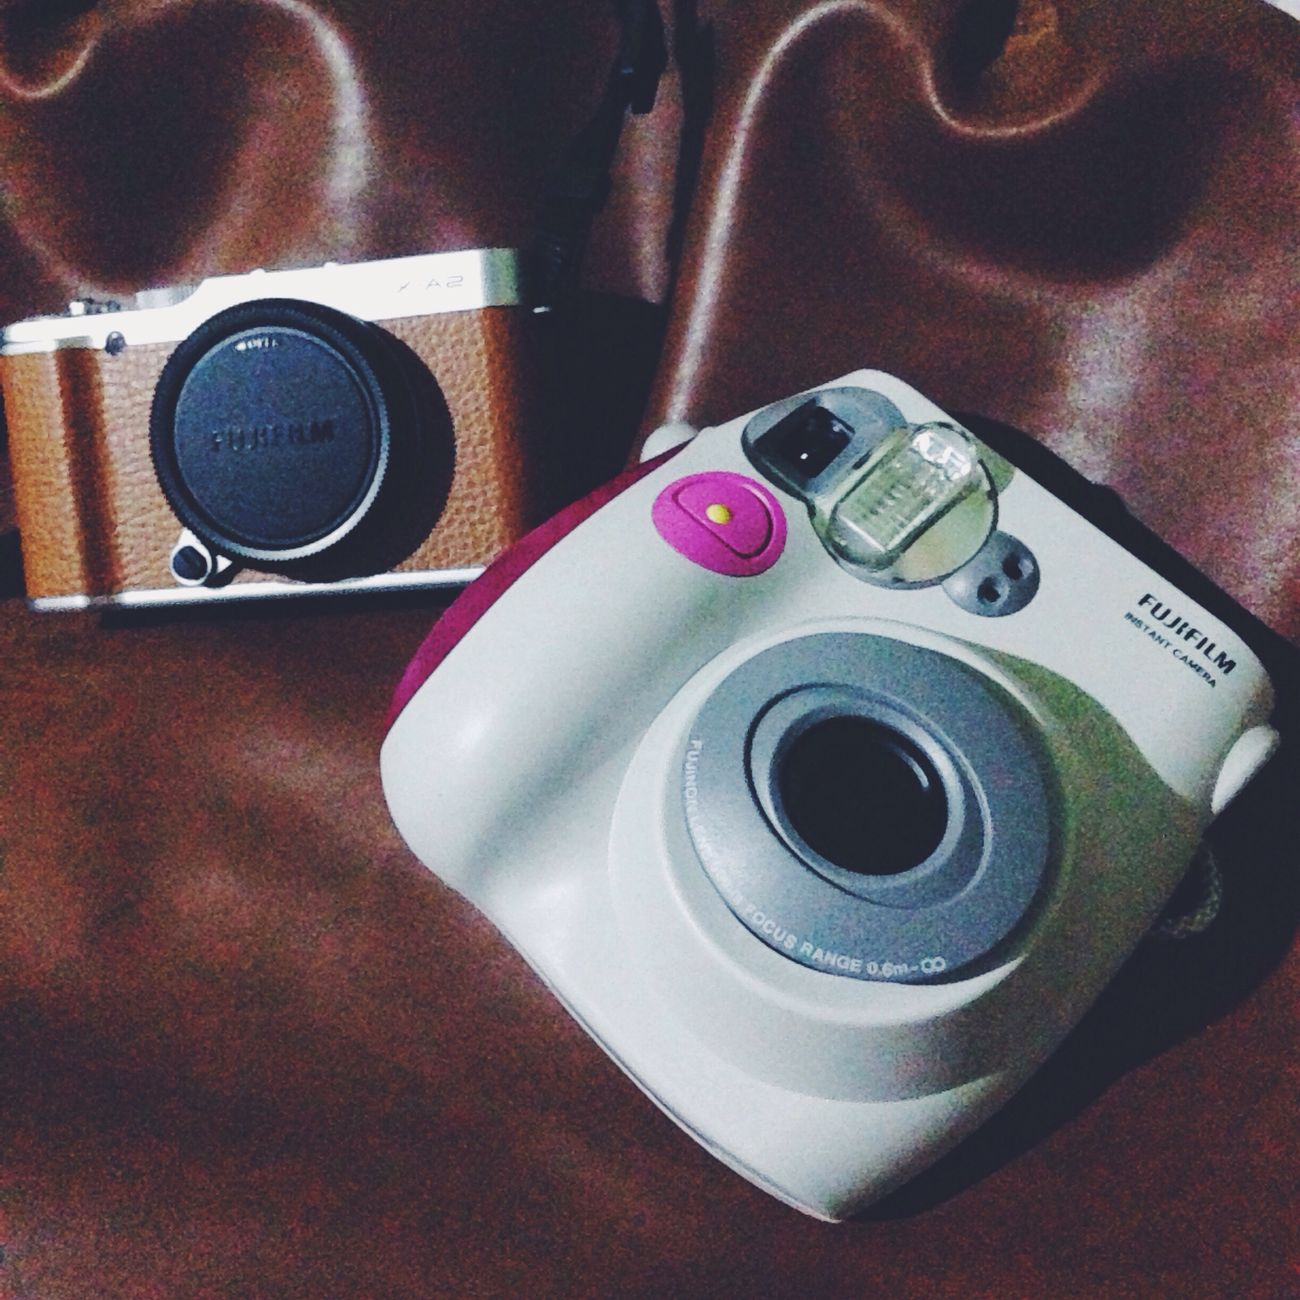 Got my new toys! 📷 so excited to play with 'em! Fujifilm Fujixa2 Fujifilm_xseries Fuji